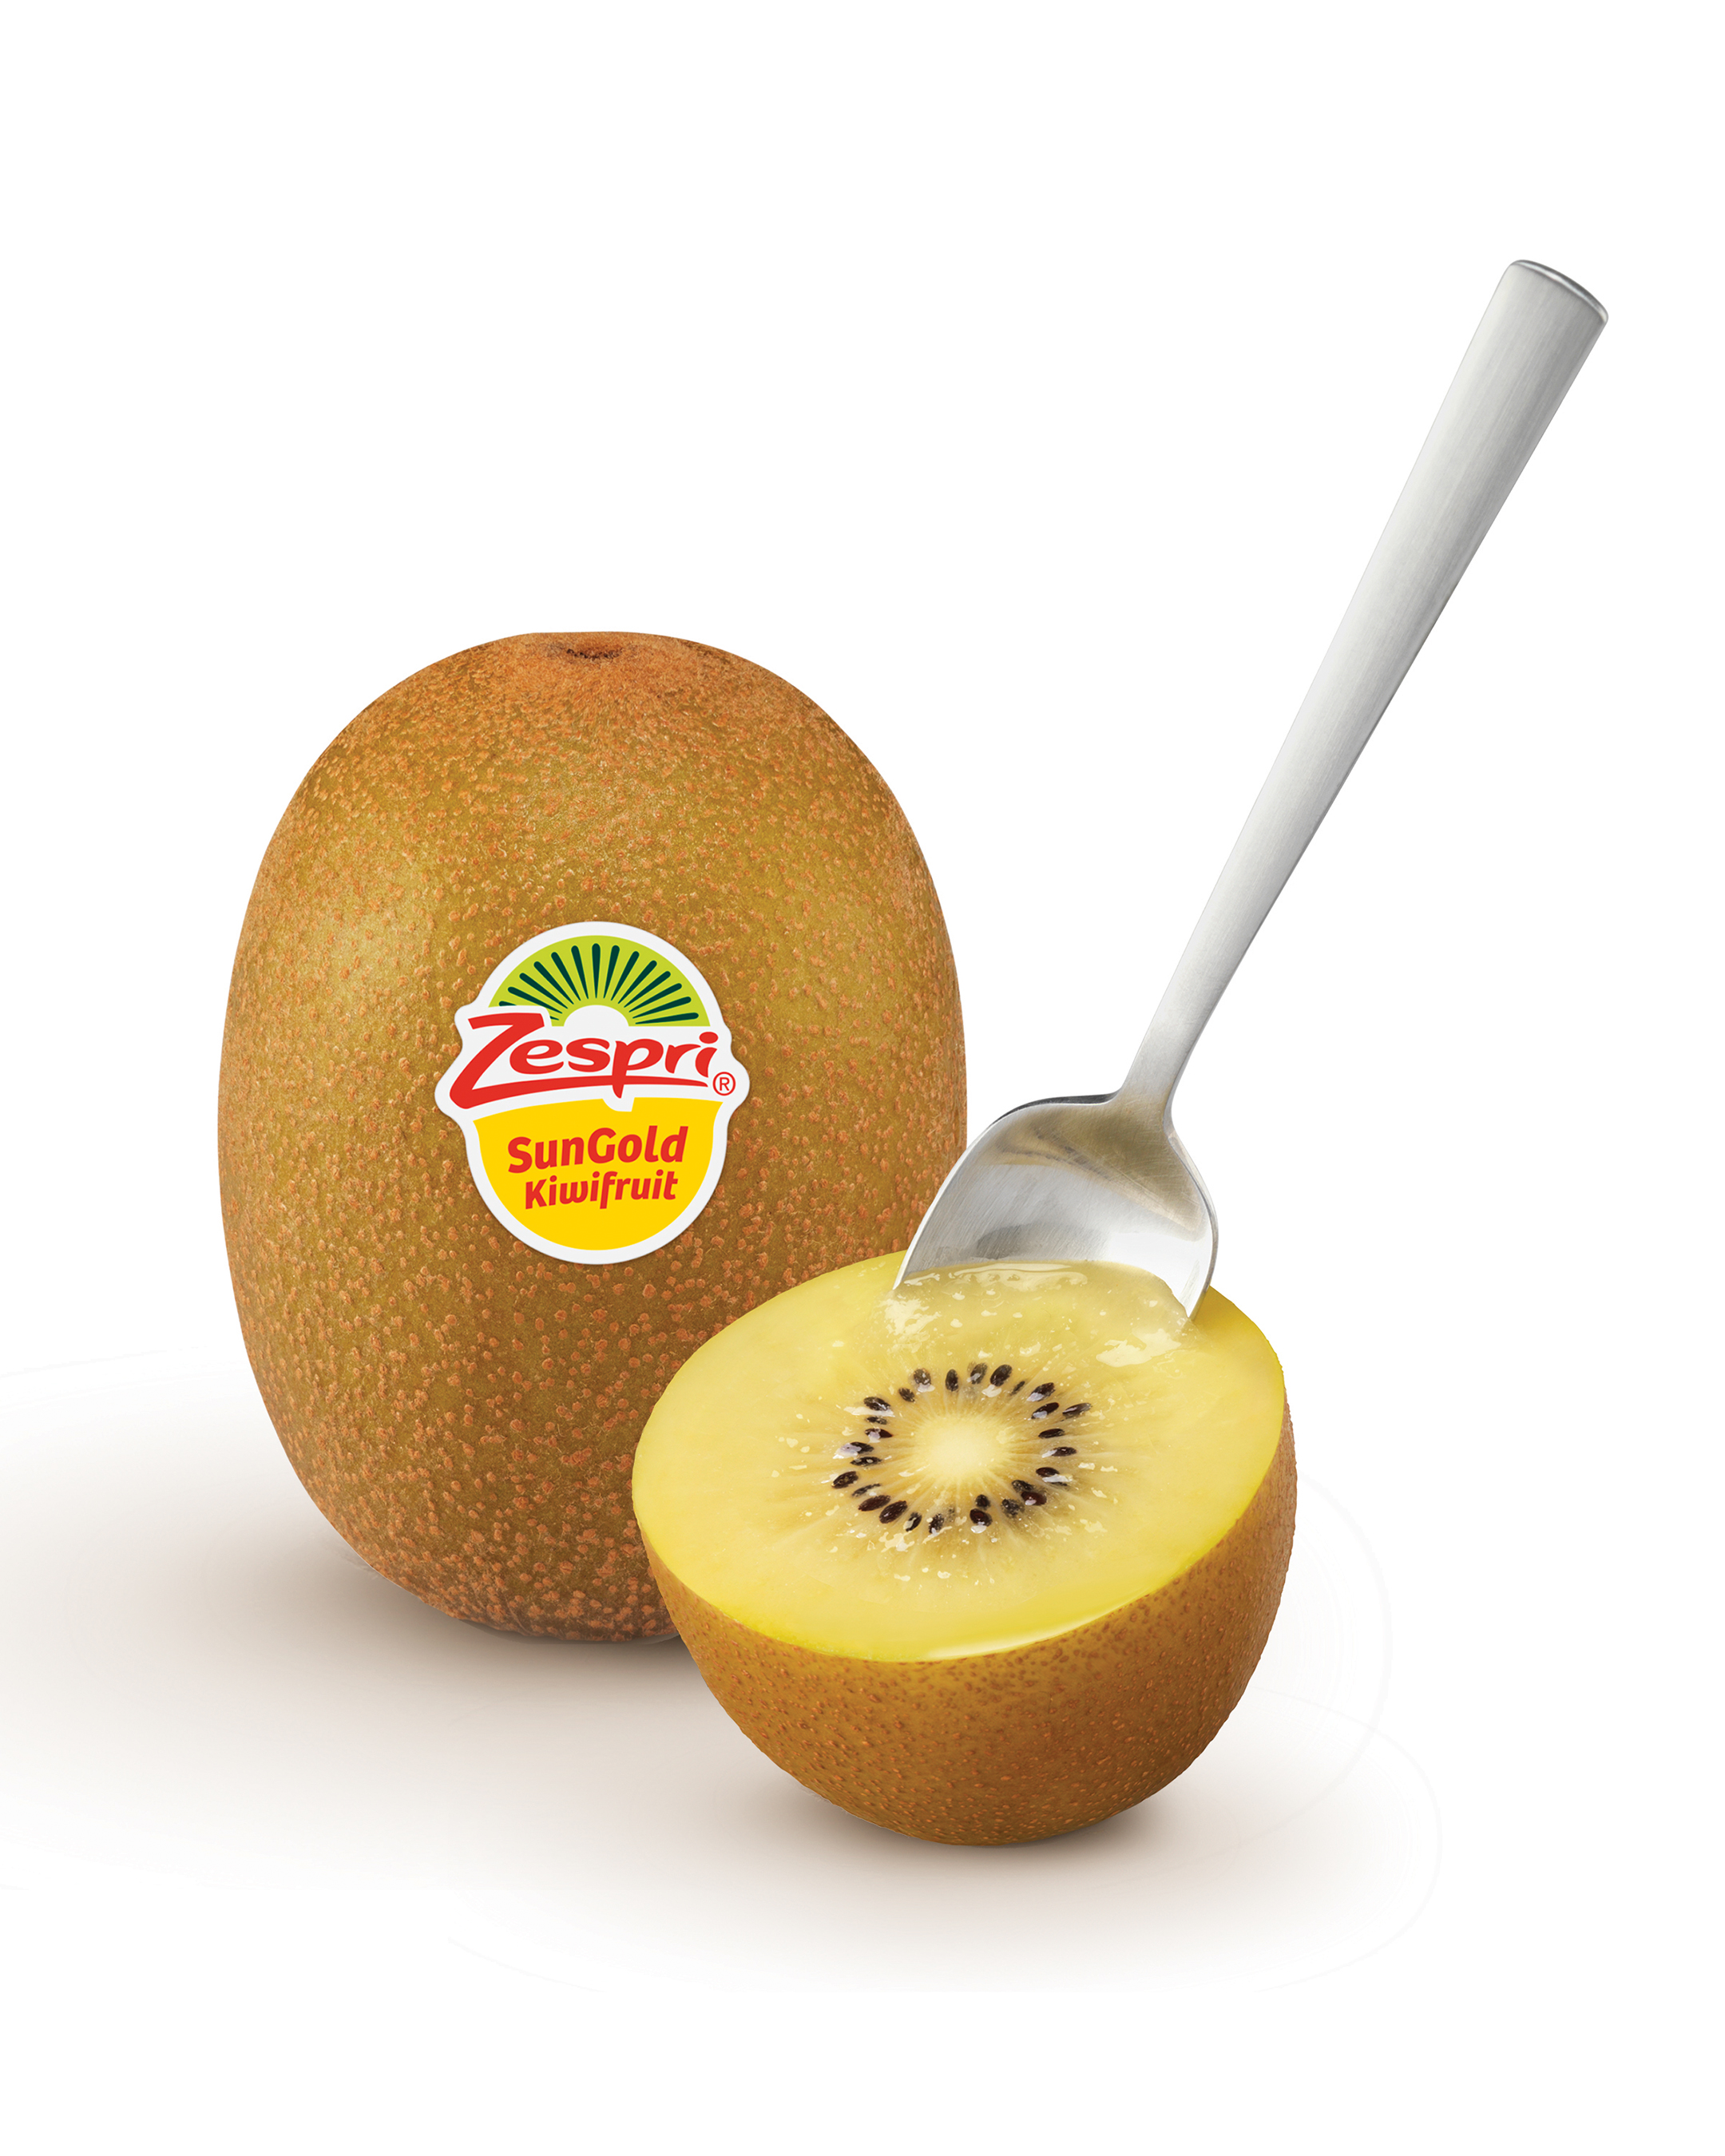 Zespri Kiwifruit, the world leader in premium quality kiwifruit, celebrates the seasonal return of SunGold Kiwis, a tropically sweet taste with a vibrant yellow flesh.